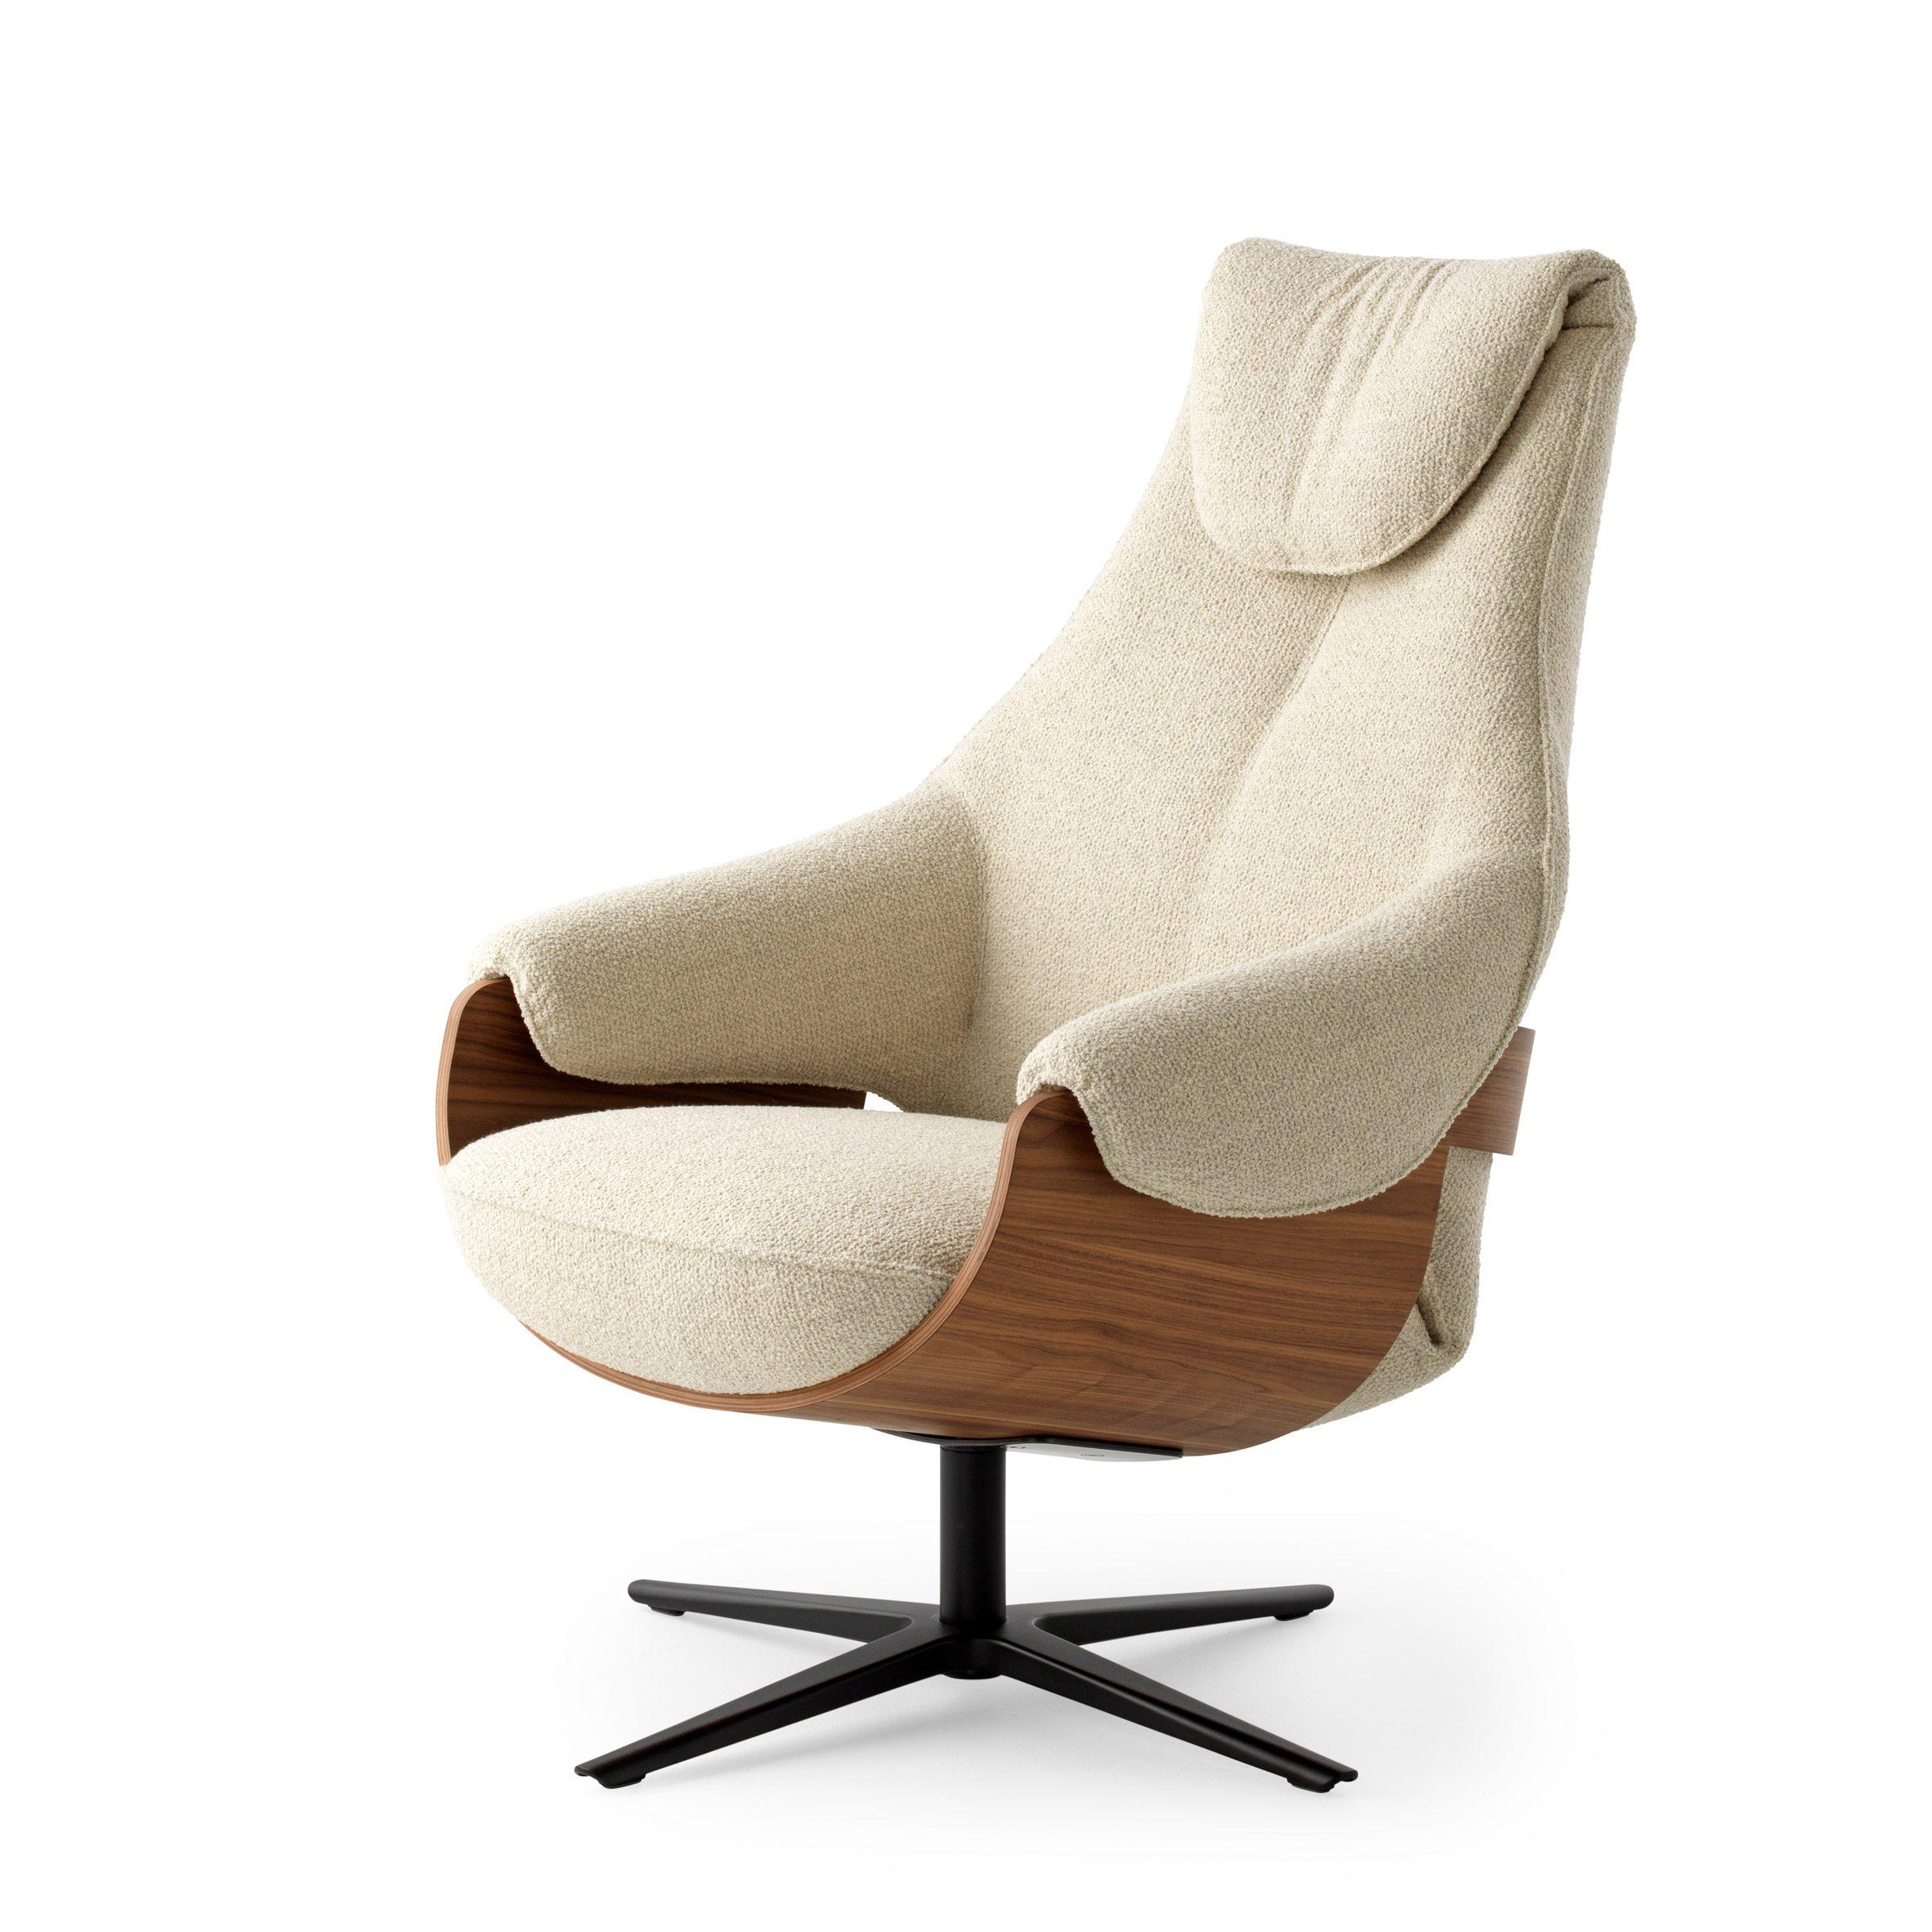 LXR10 armchair by Studio Truly Truly for Leolux LX